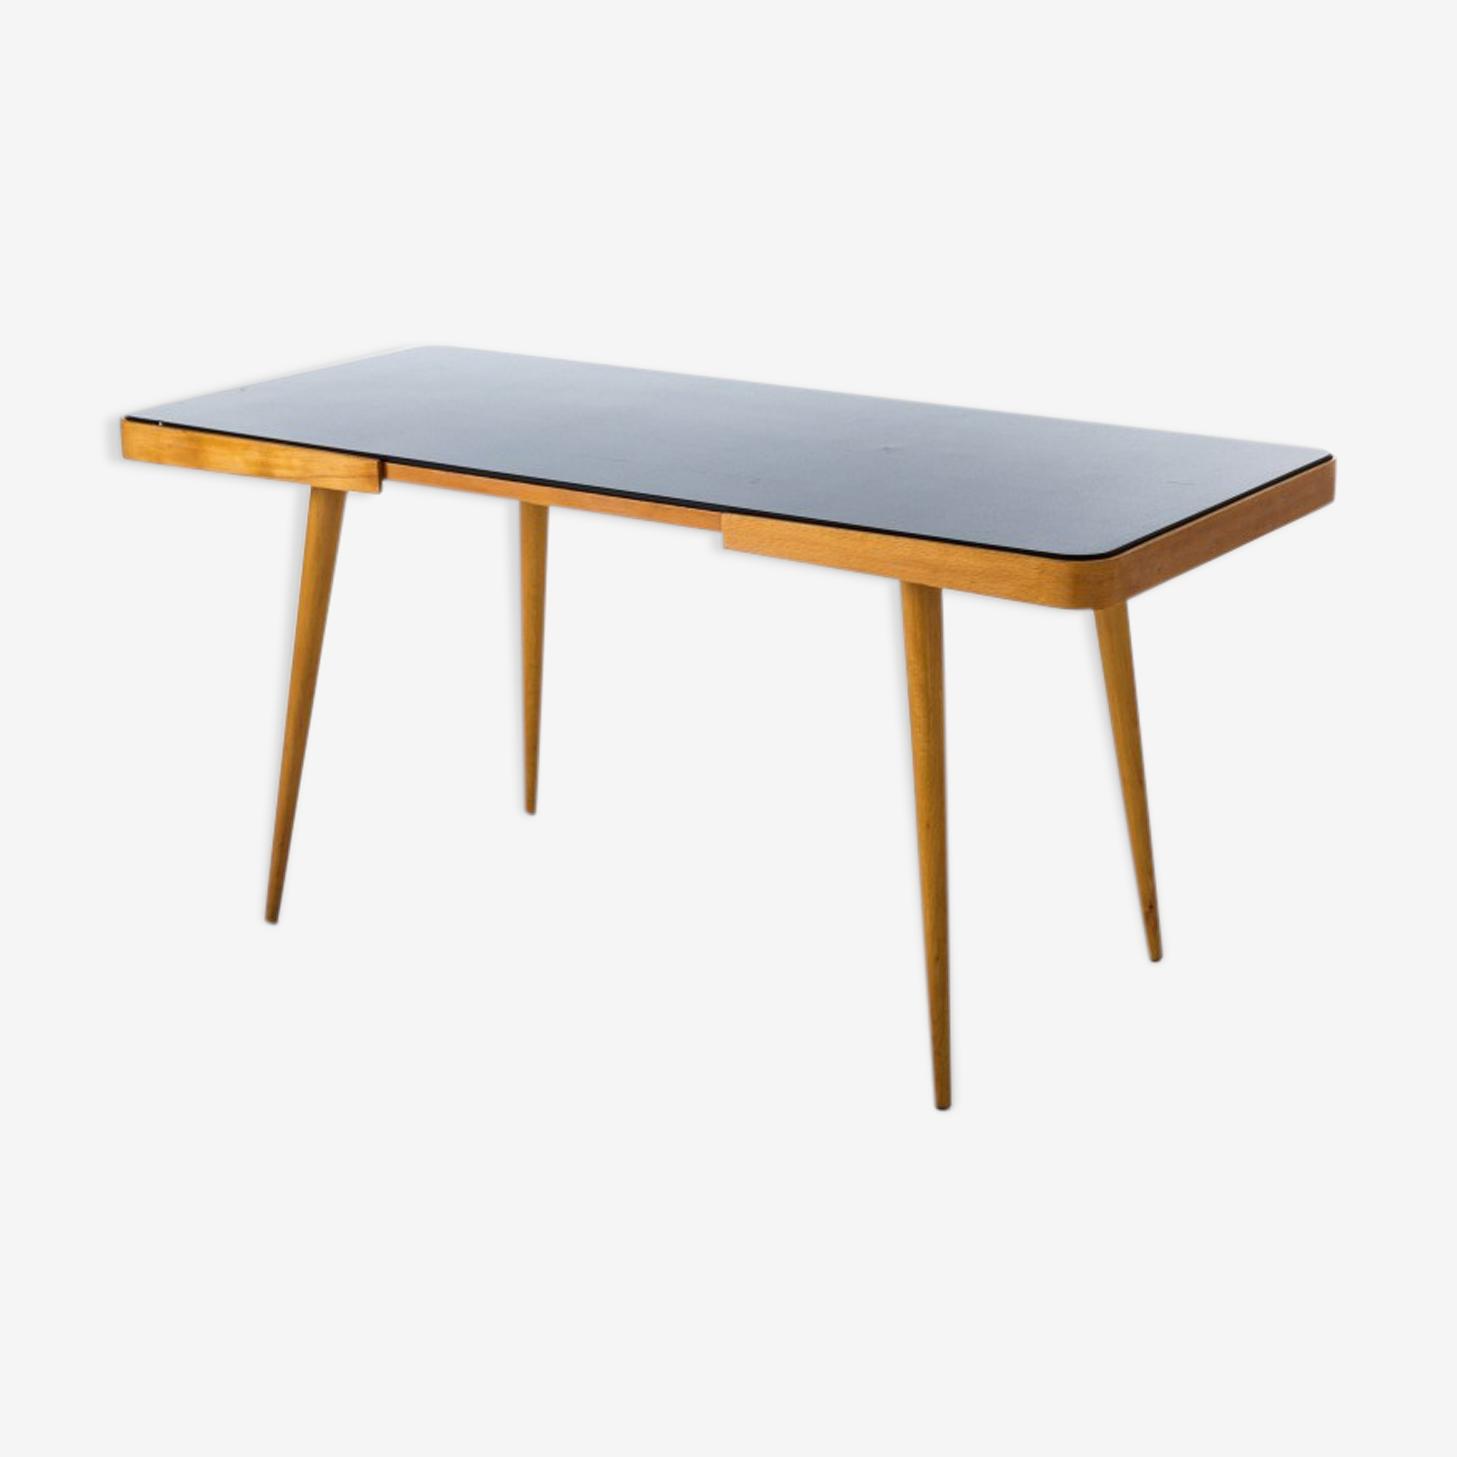 Table basse iri Jiroutek